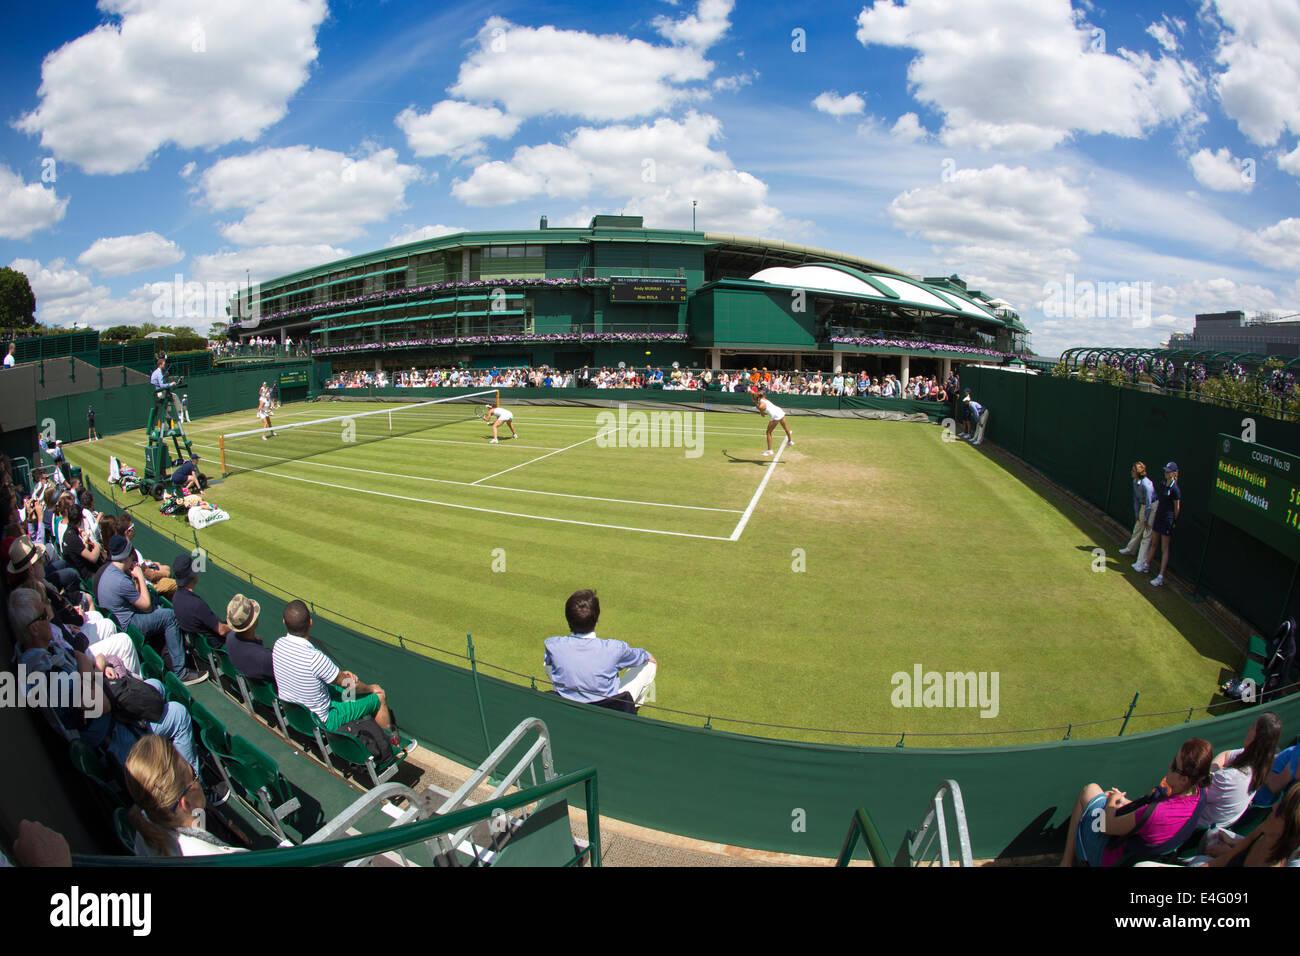 Mostrar el Juzgado Nº19, Campeonatos de Tenis de Wimbledon 2014, al suroeste de Londres, Inglaterra, Reino Imagen De Stock